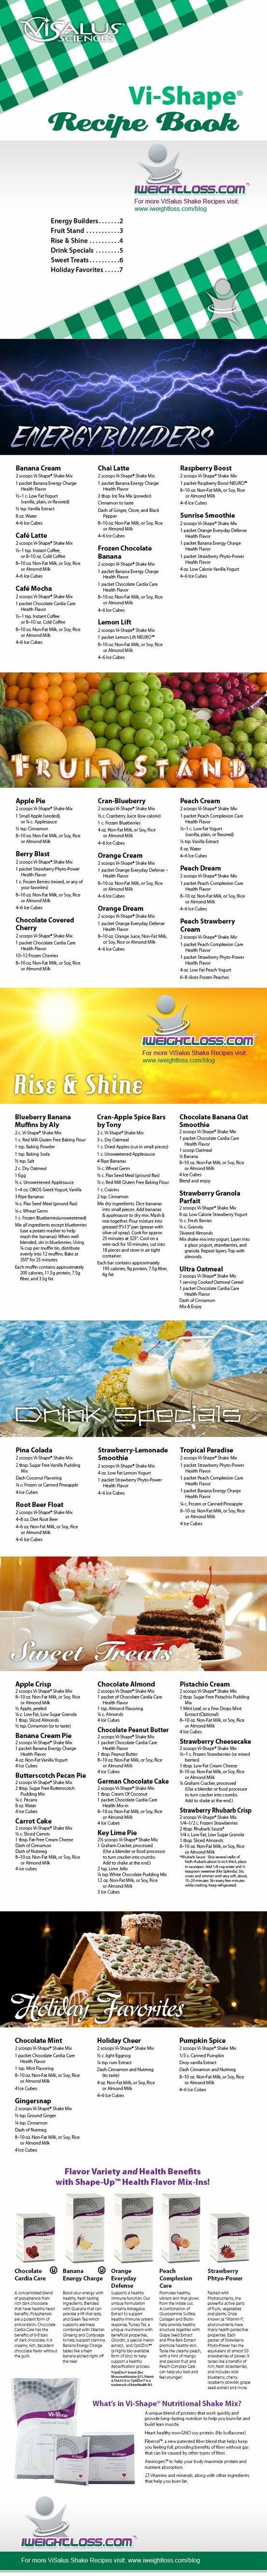 ViSalus Shakes Recipe Book